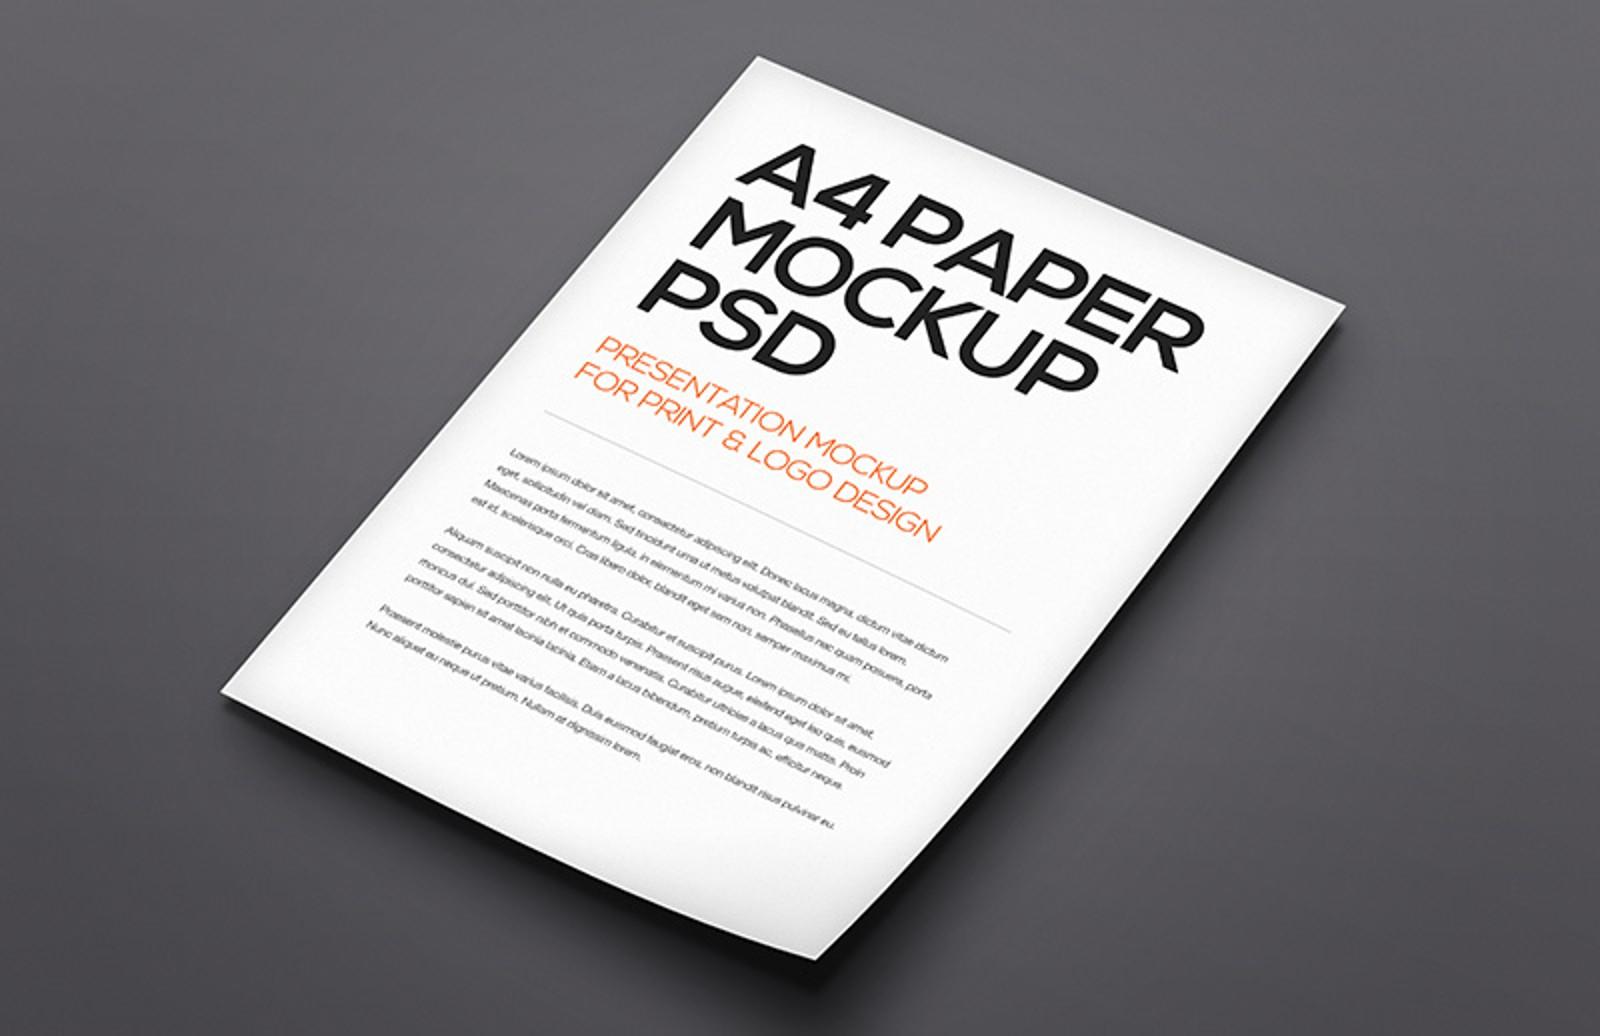 Download Floating A4 Paper Mockup Vol 1 — Medialoot